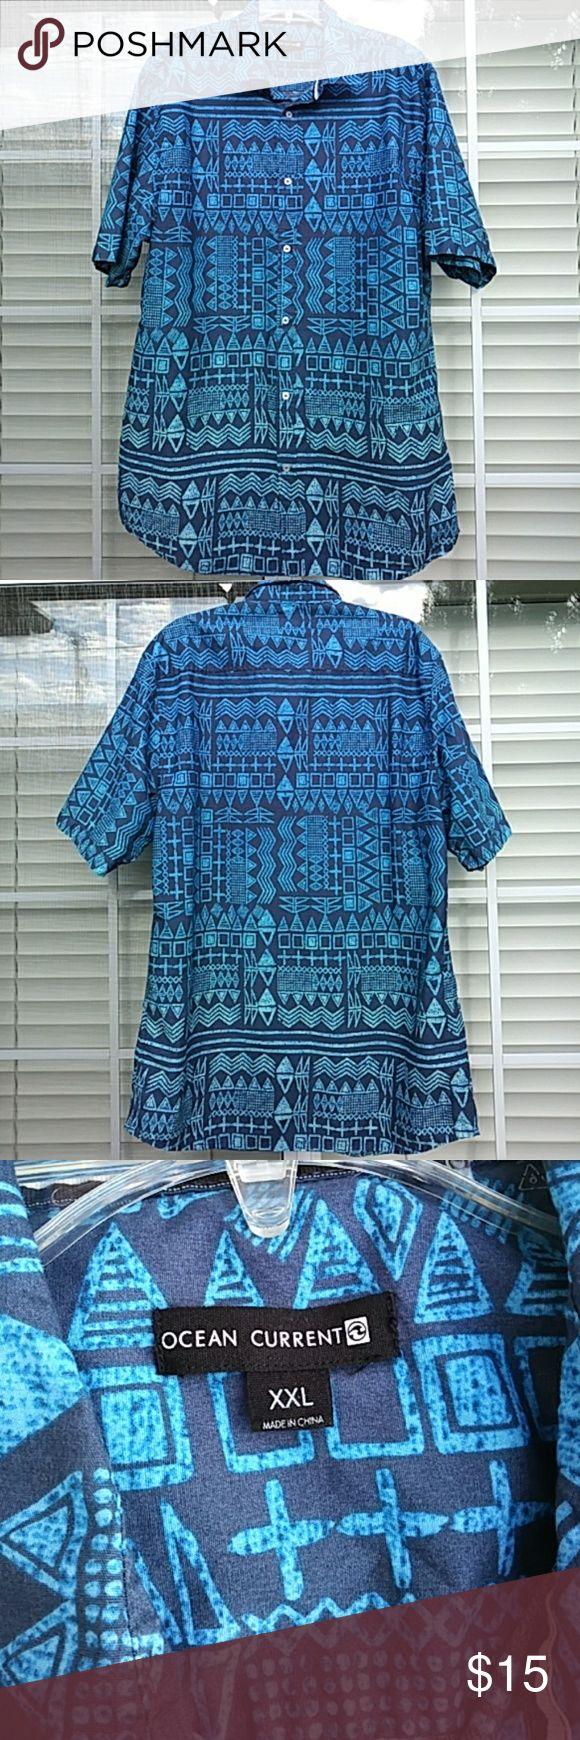 OCEAN CURRENT - XXL OCEAN CURRENT 100% cotton, short sleeve, print, button down shirt. Blue, easy care. Size XXL. Ocean Current Shirts Casual Button Down Shirts